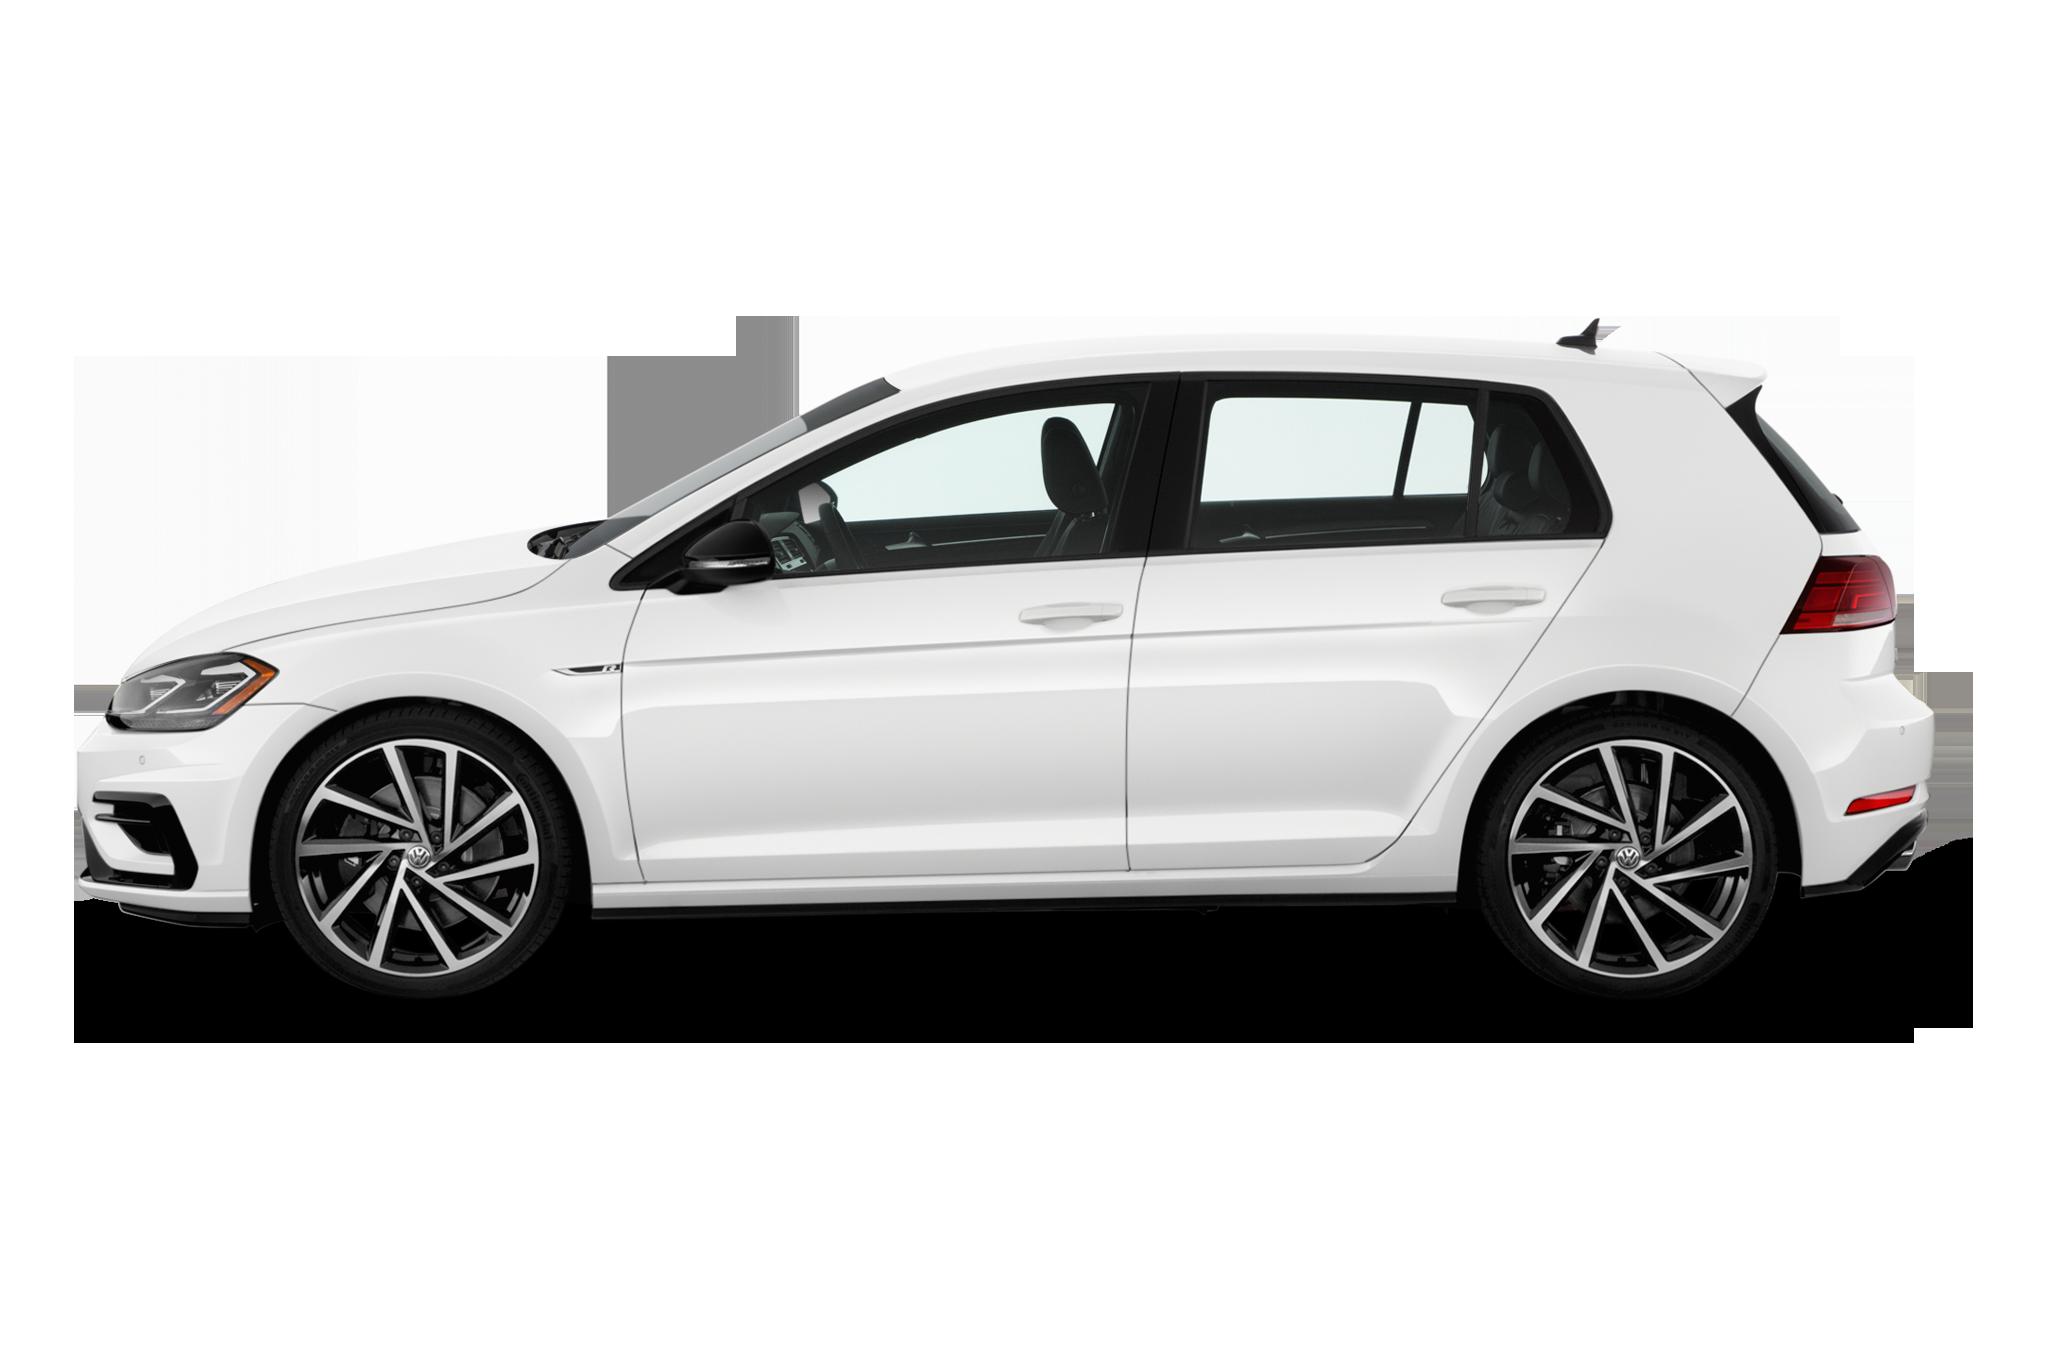 2018 volkswagen golf 1 5 tsi euro spec quick take review automobile magazine. Black Bedroom Furniture Sets. Home Design Ideas